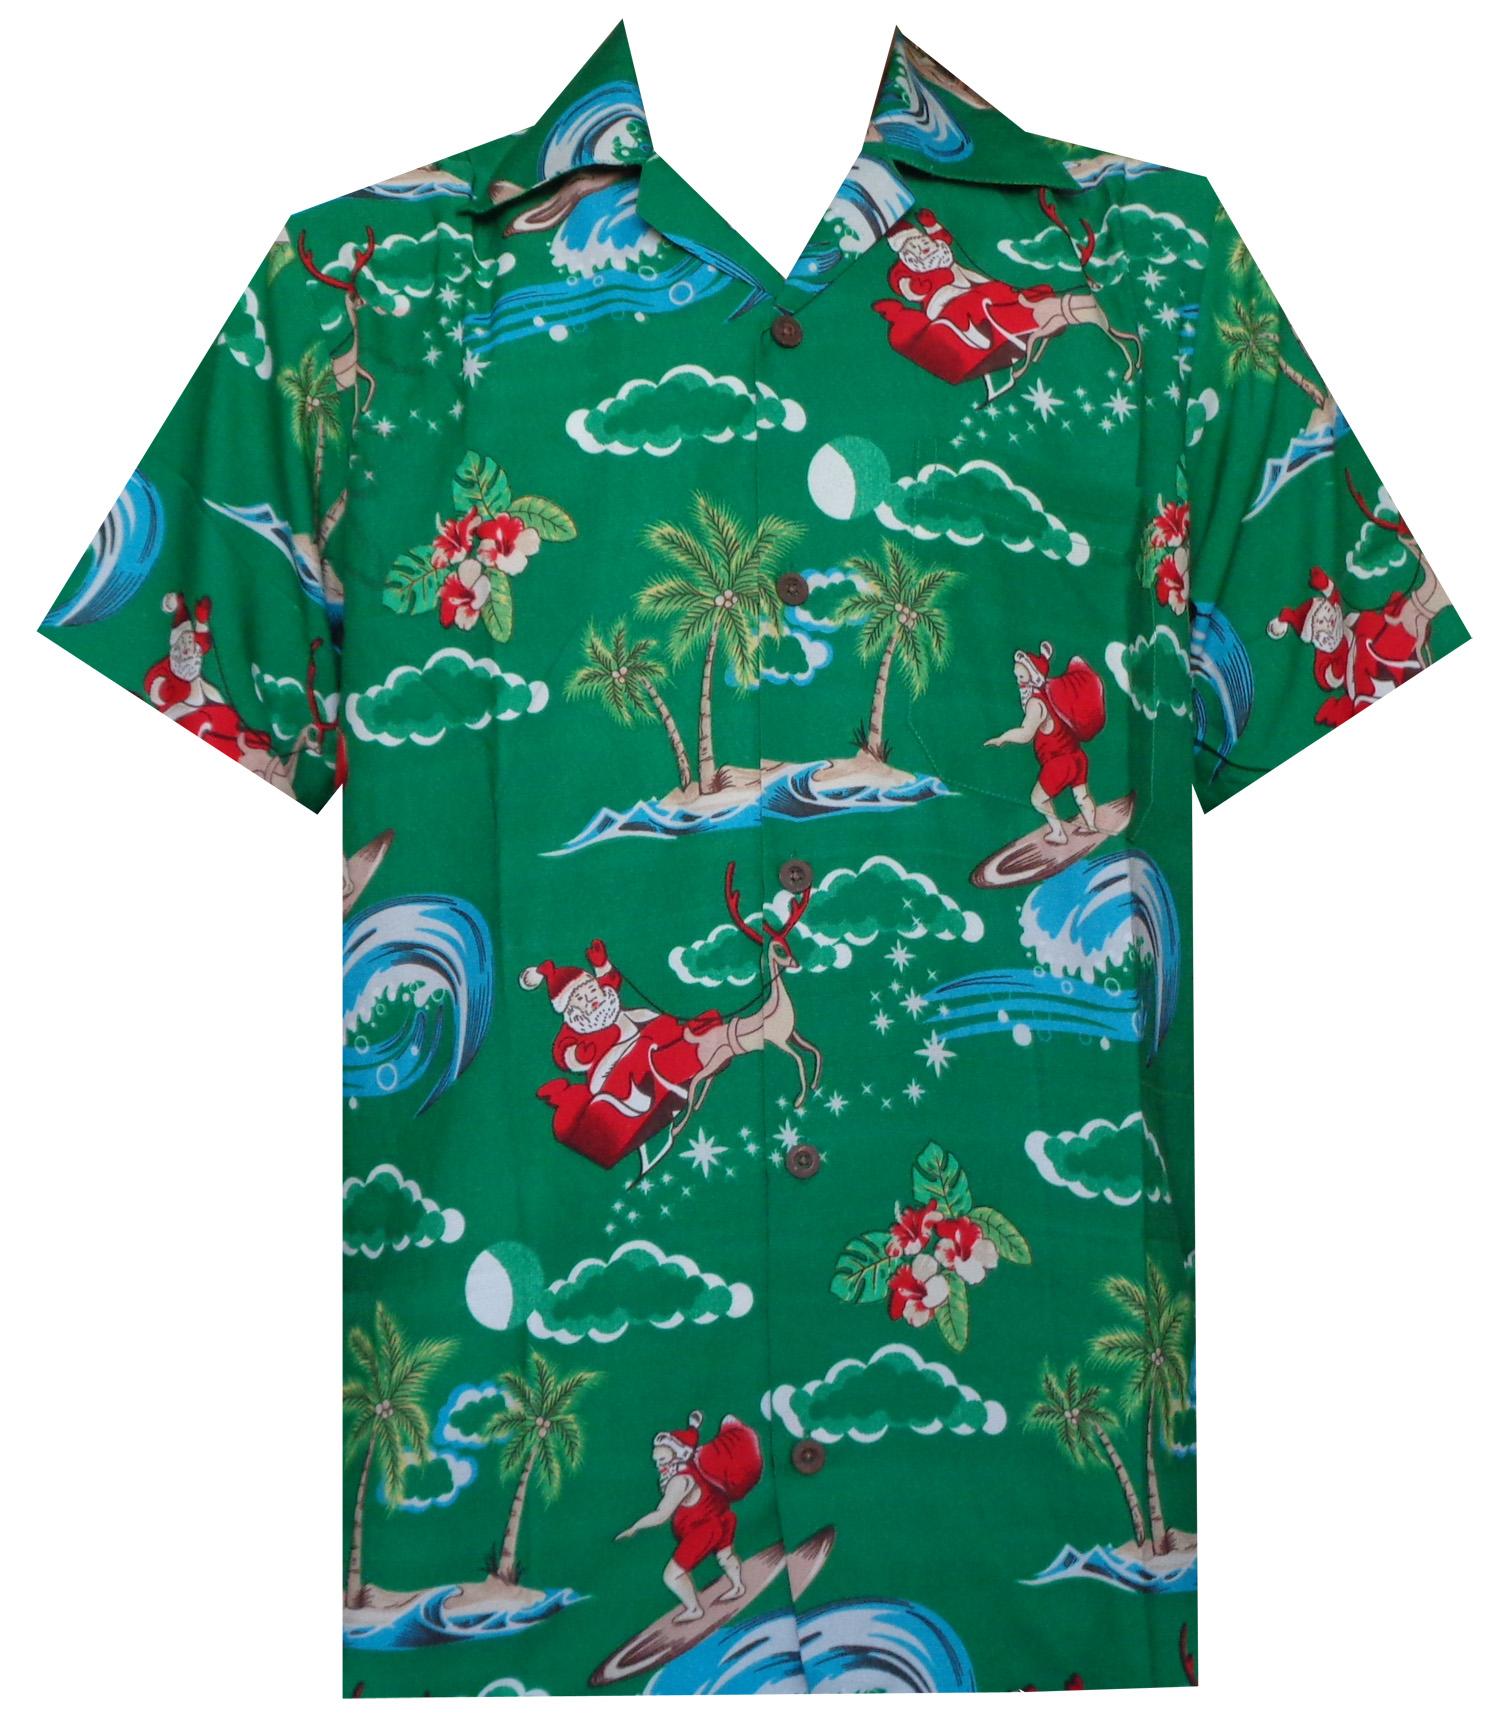 93eac704 Alvish Hawaiian Shirt 41 Mens Christmas Santa Claus Party Aloha ...